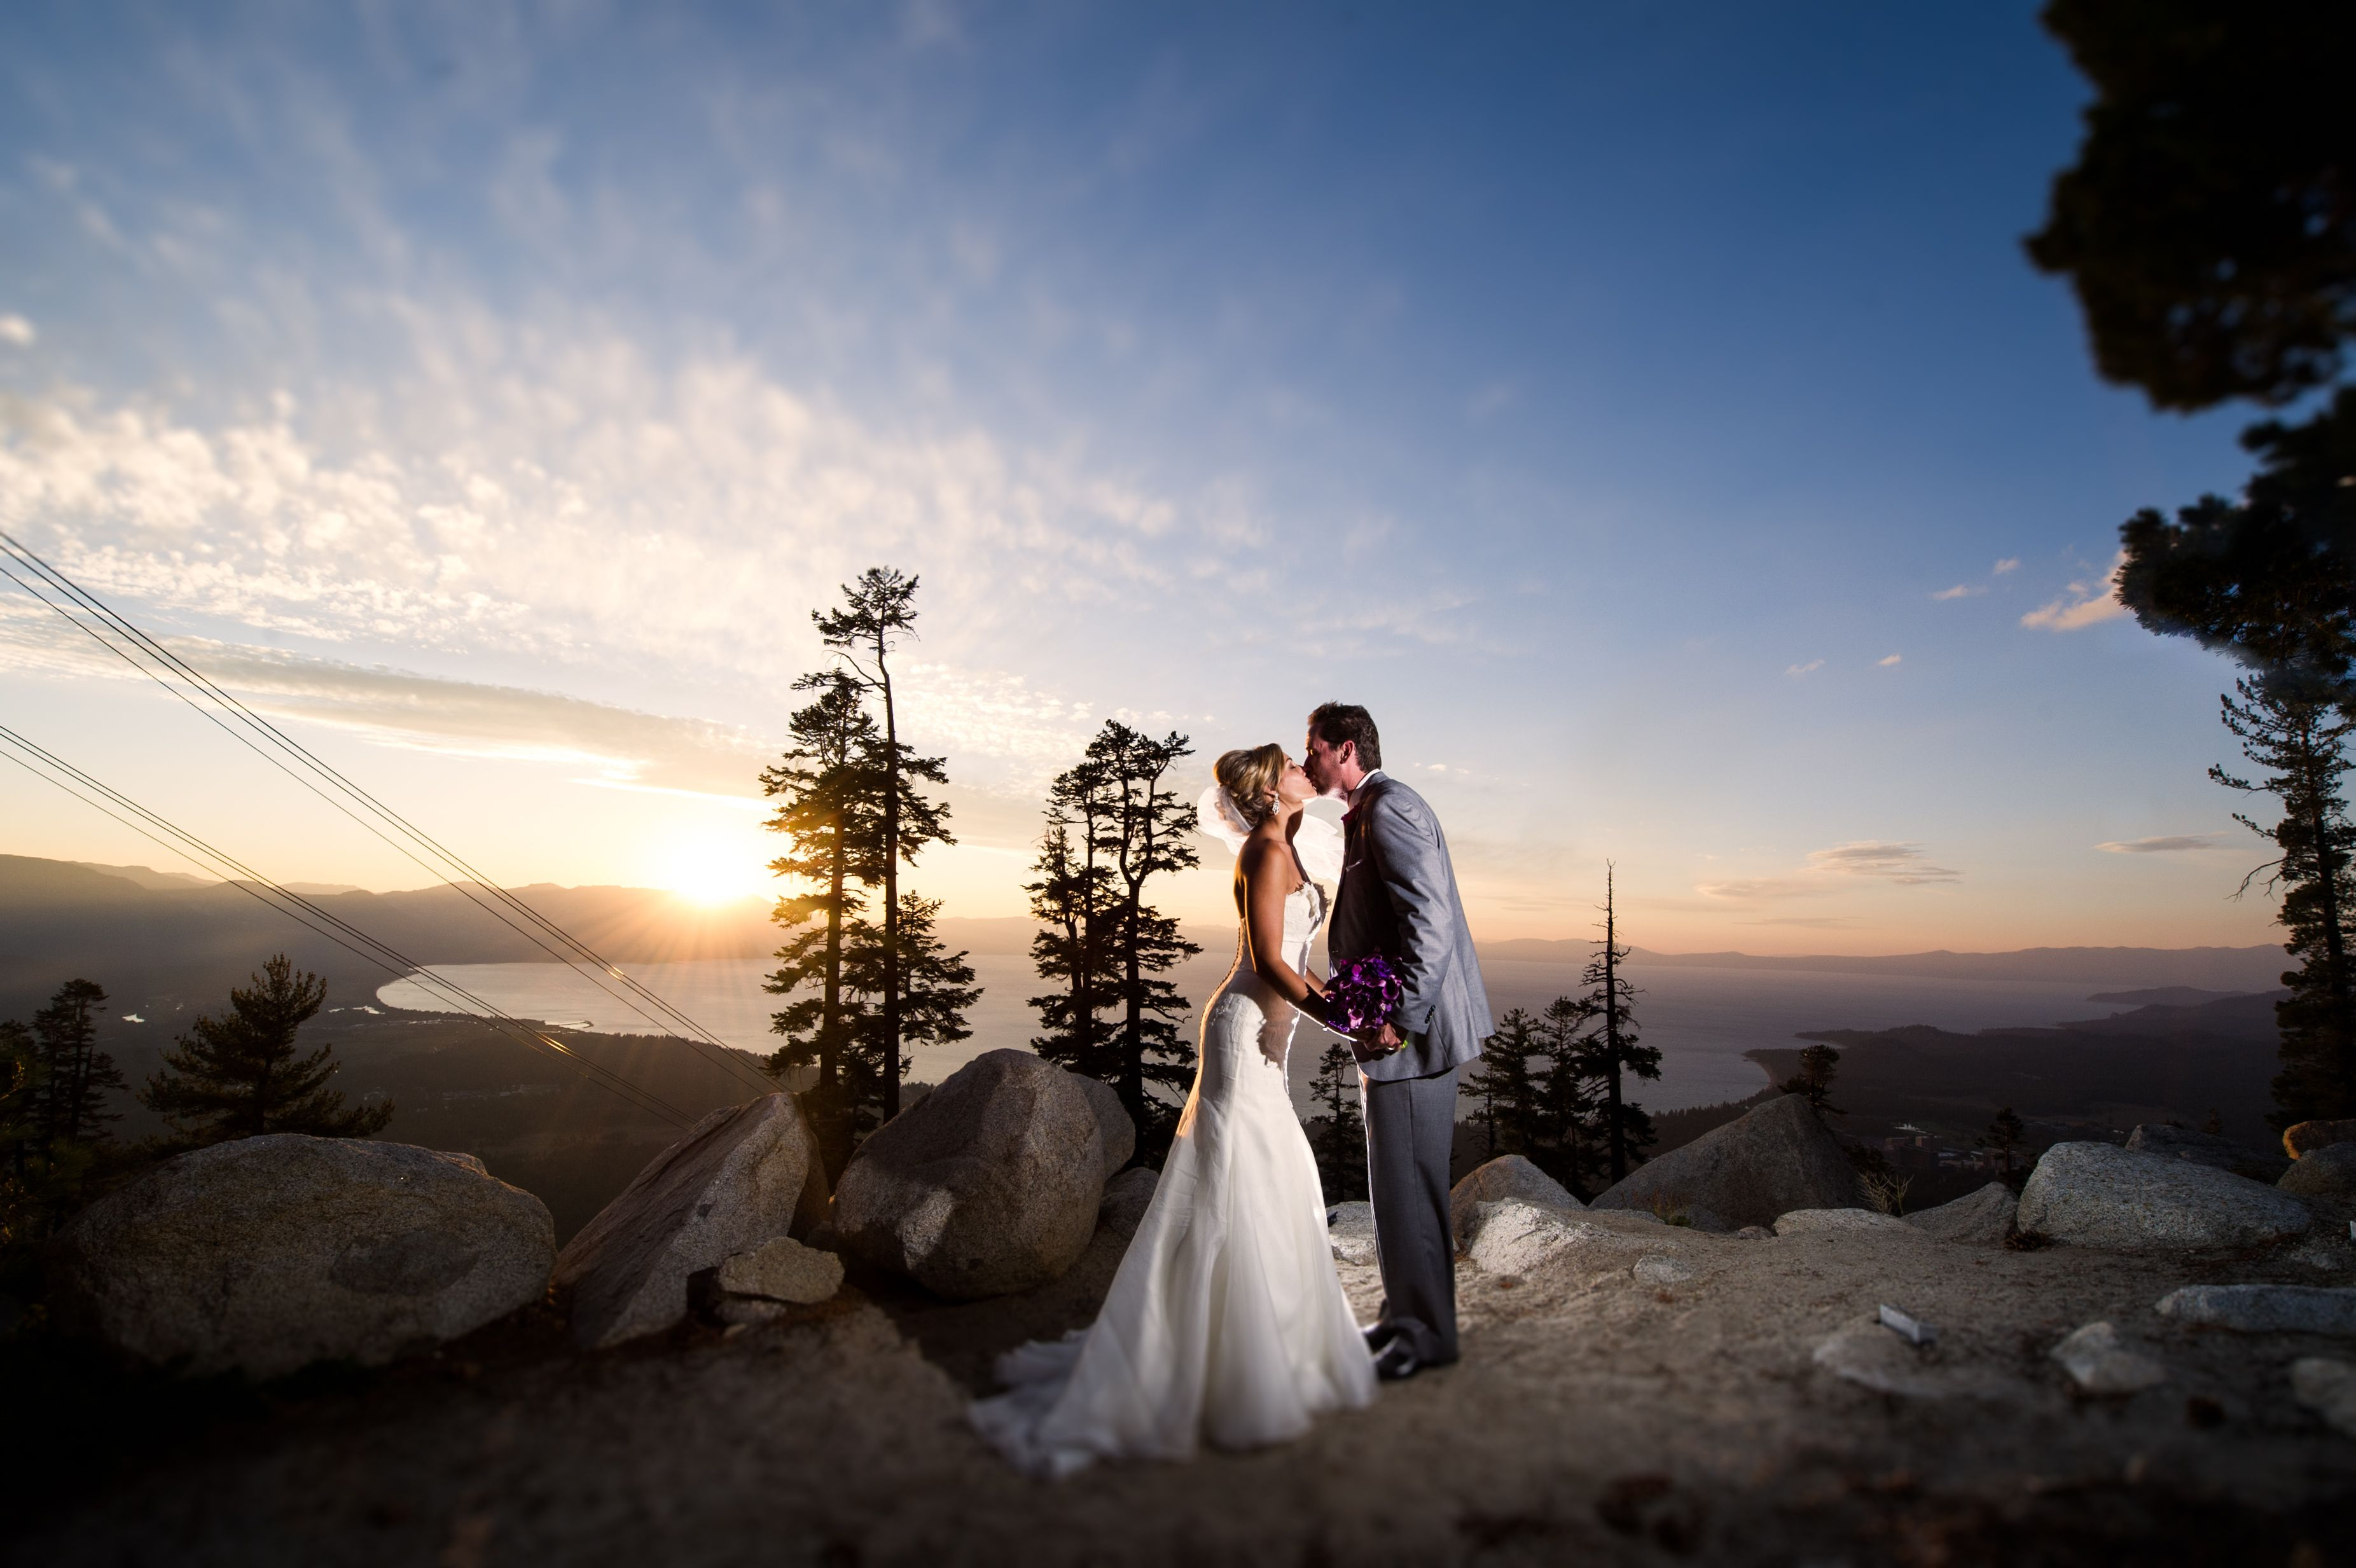 Mountain Top Wedding Venue, Lake Tahoe, CA, Heavenly